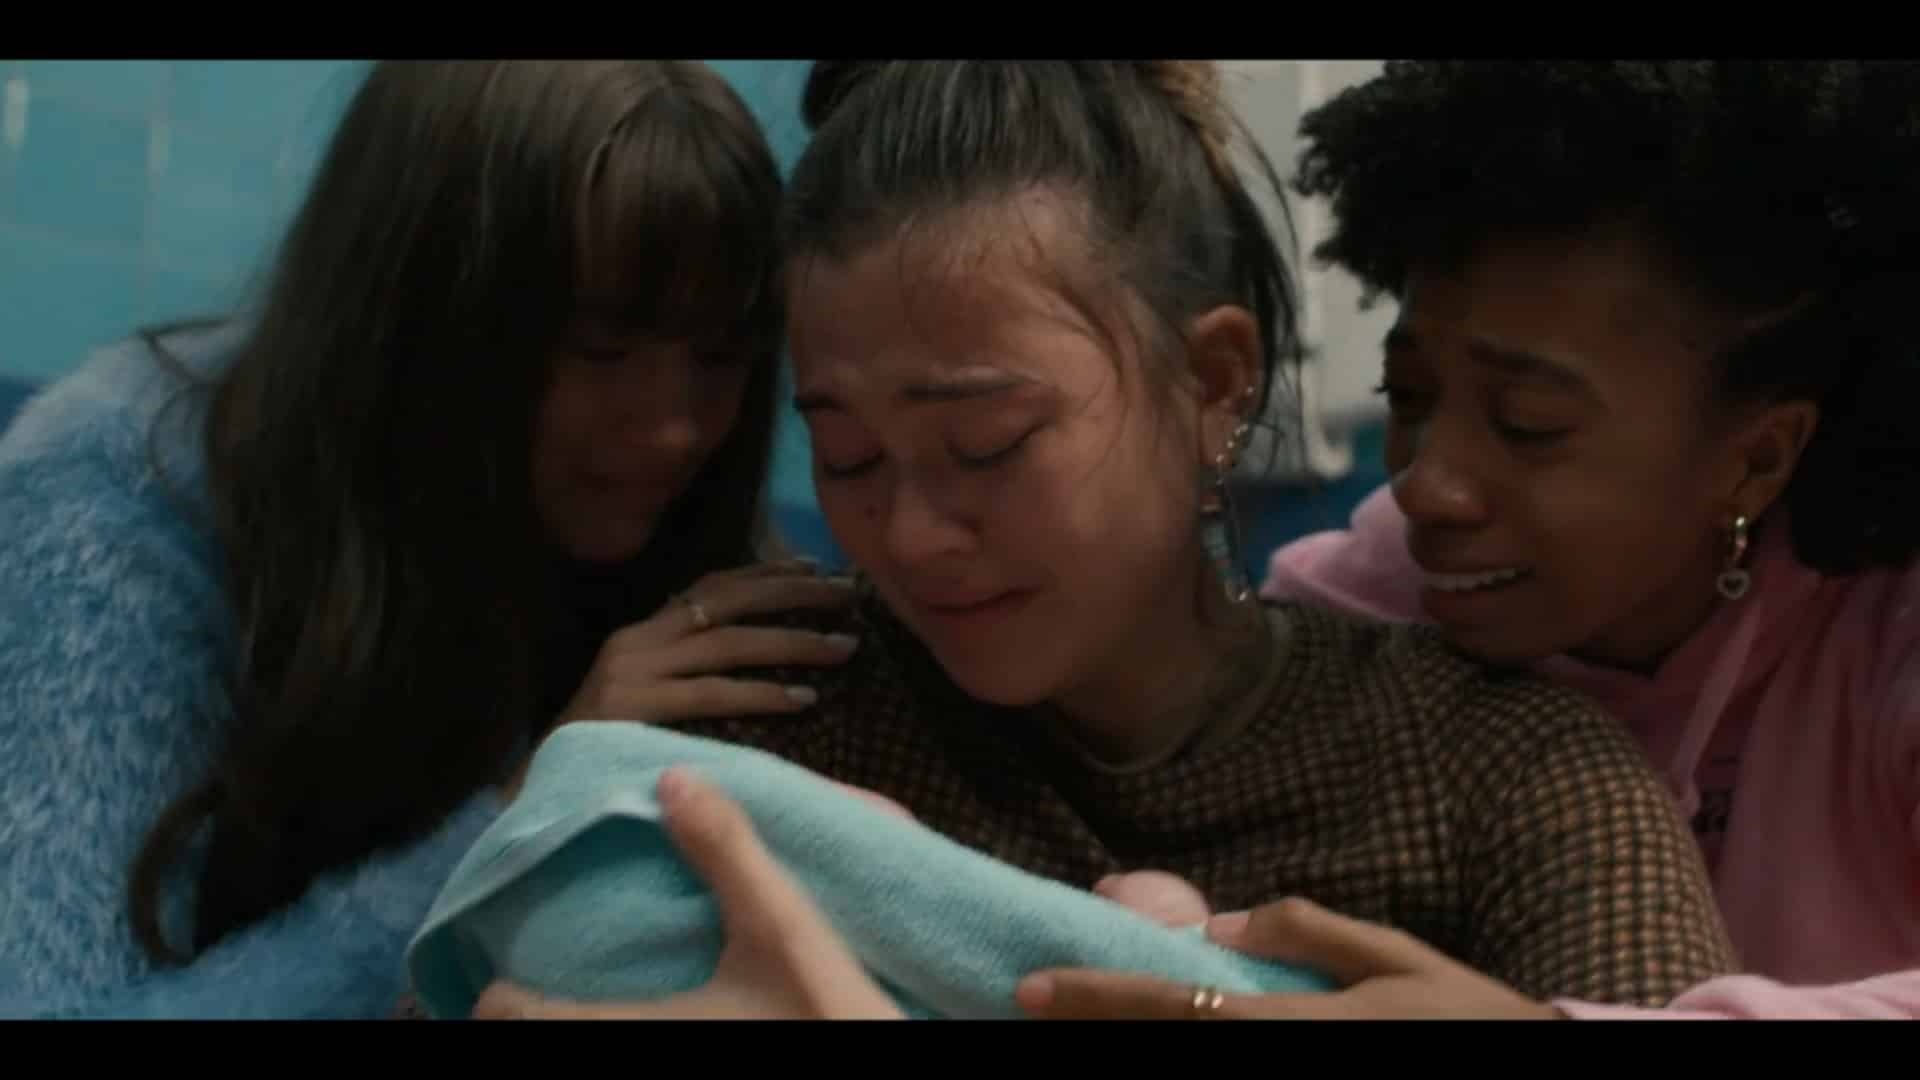 Naomi, Delilah, and Arianna looking at Delilah's just born baby